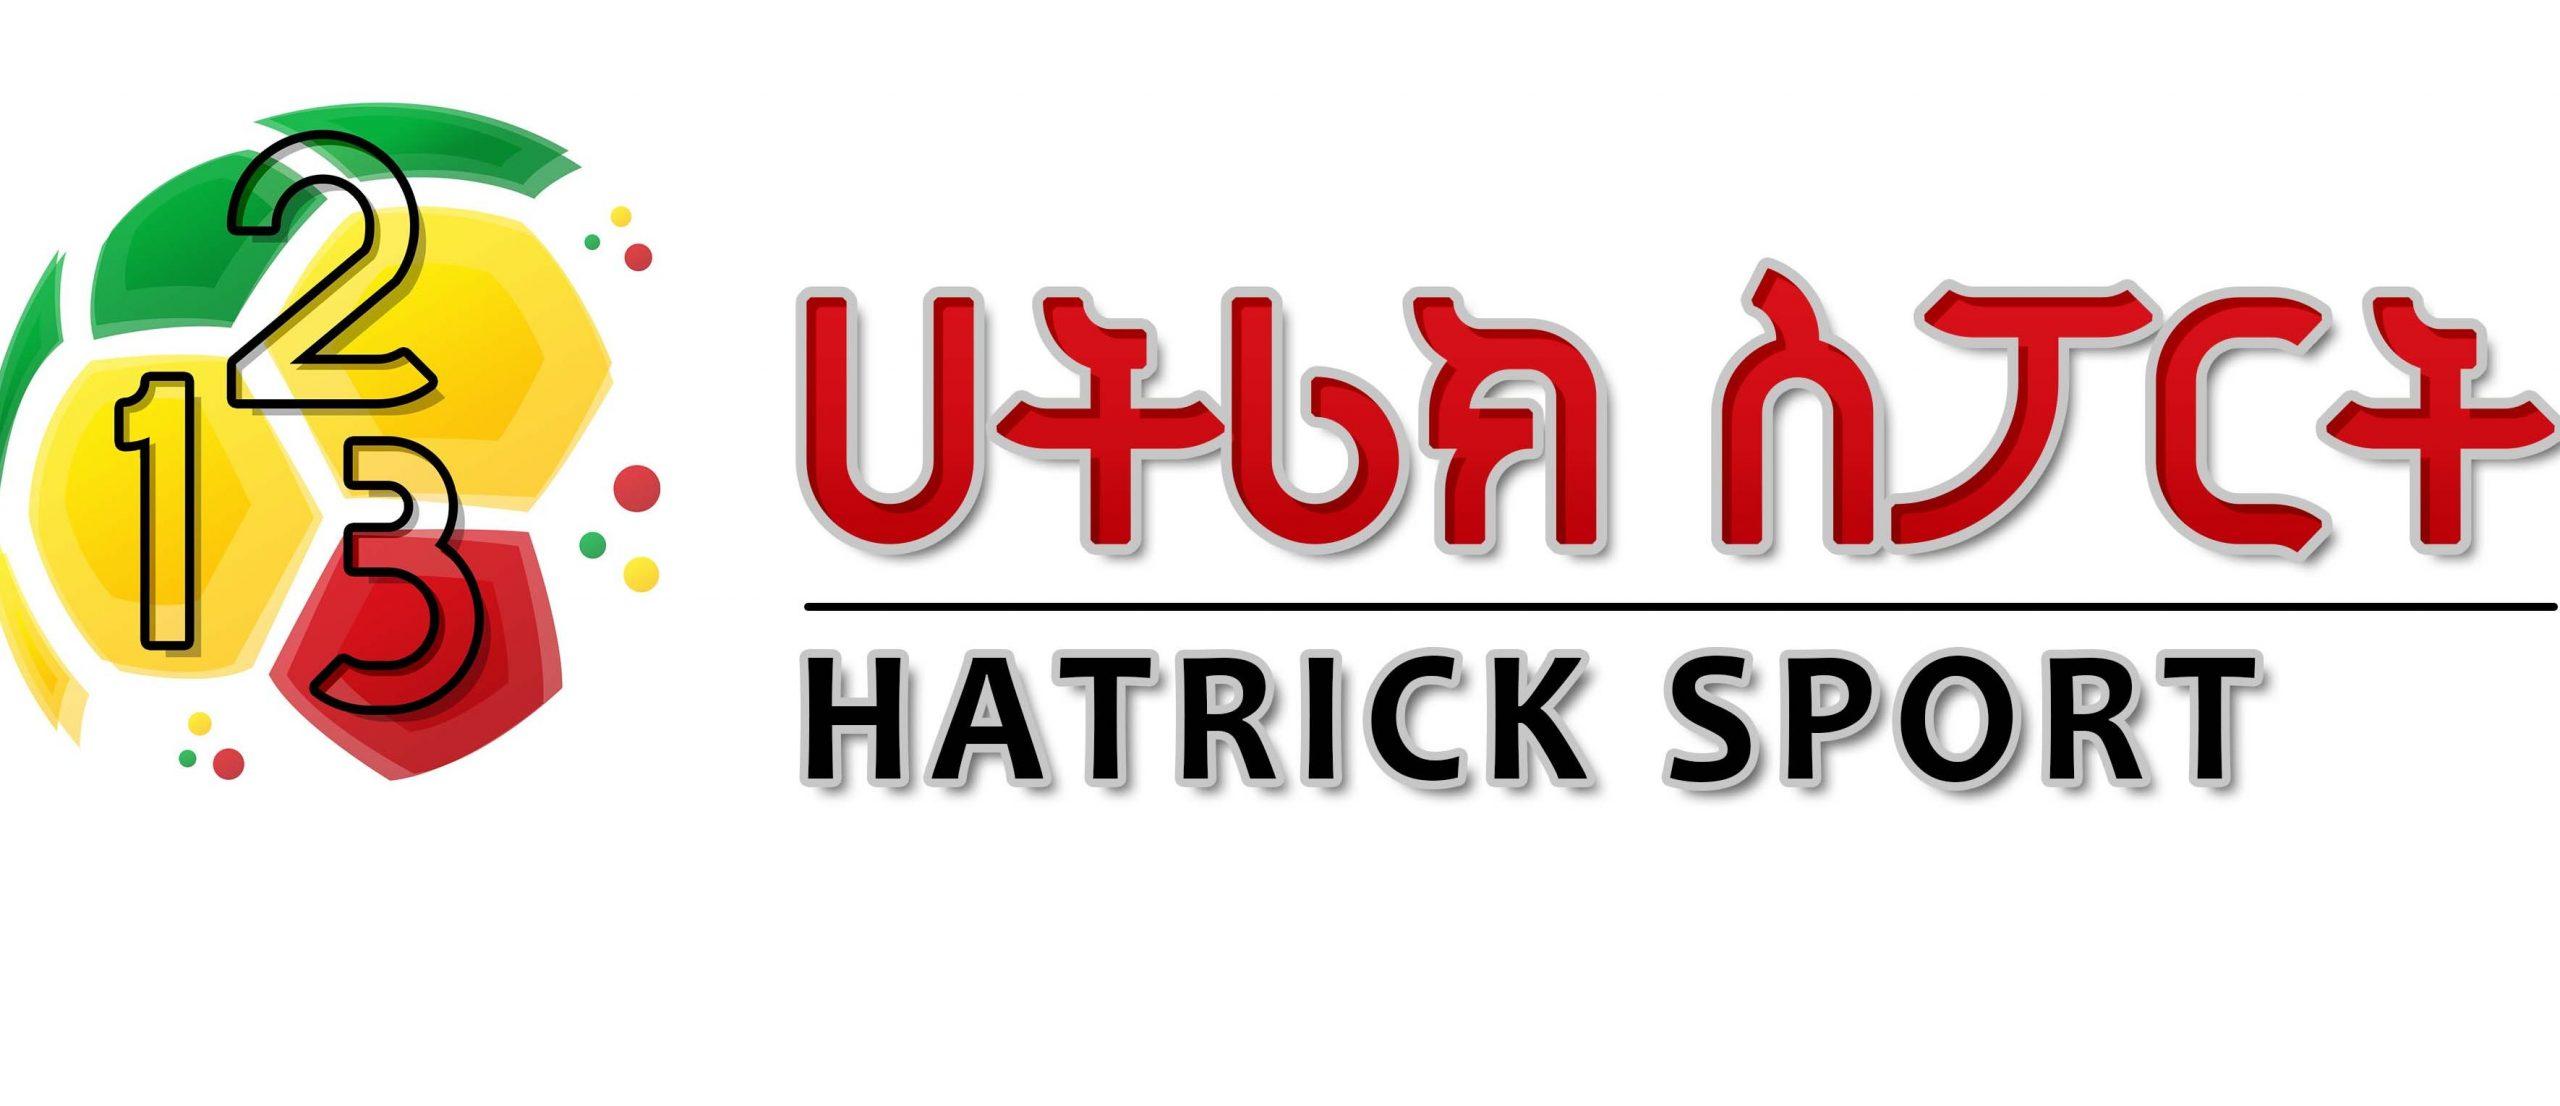 HATRICKSPORT